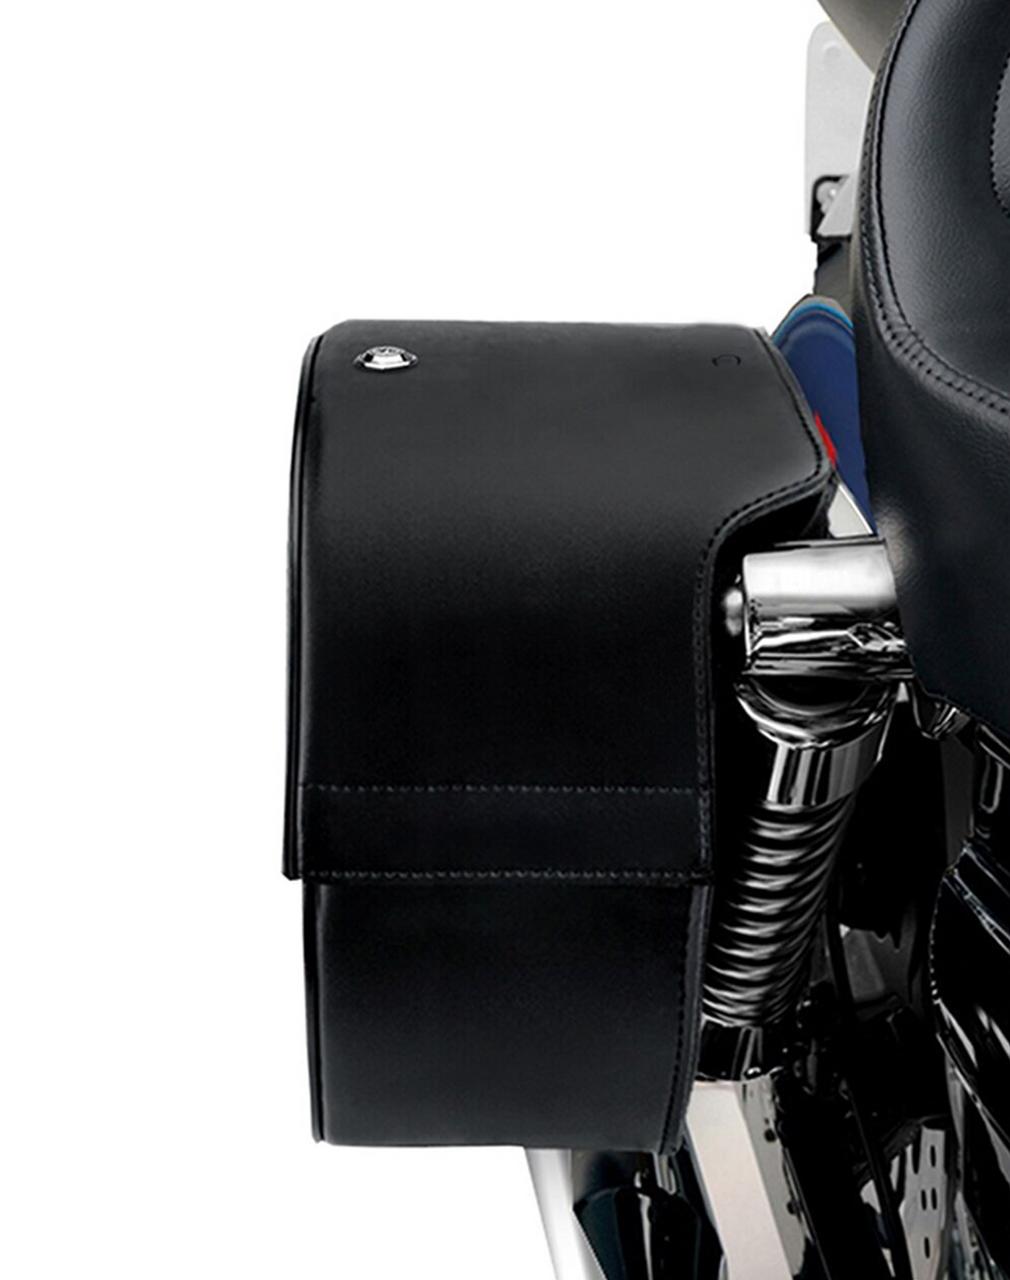 Honda VTX 1800 F Shock Cutout Slanted Large Motorcycle Saddlebags Shock cutout View